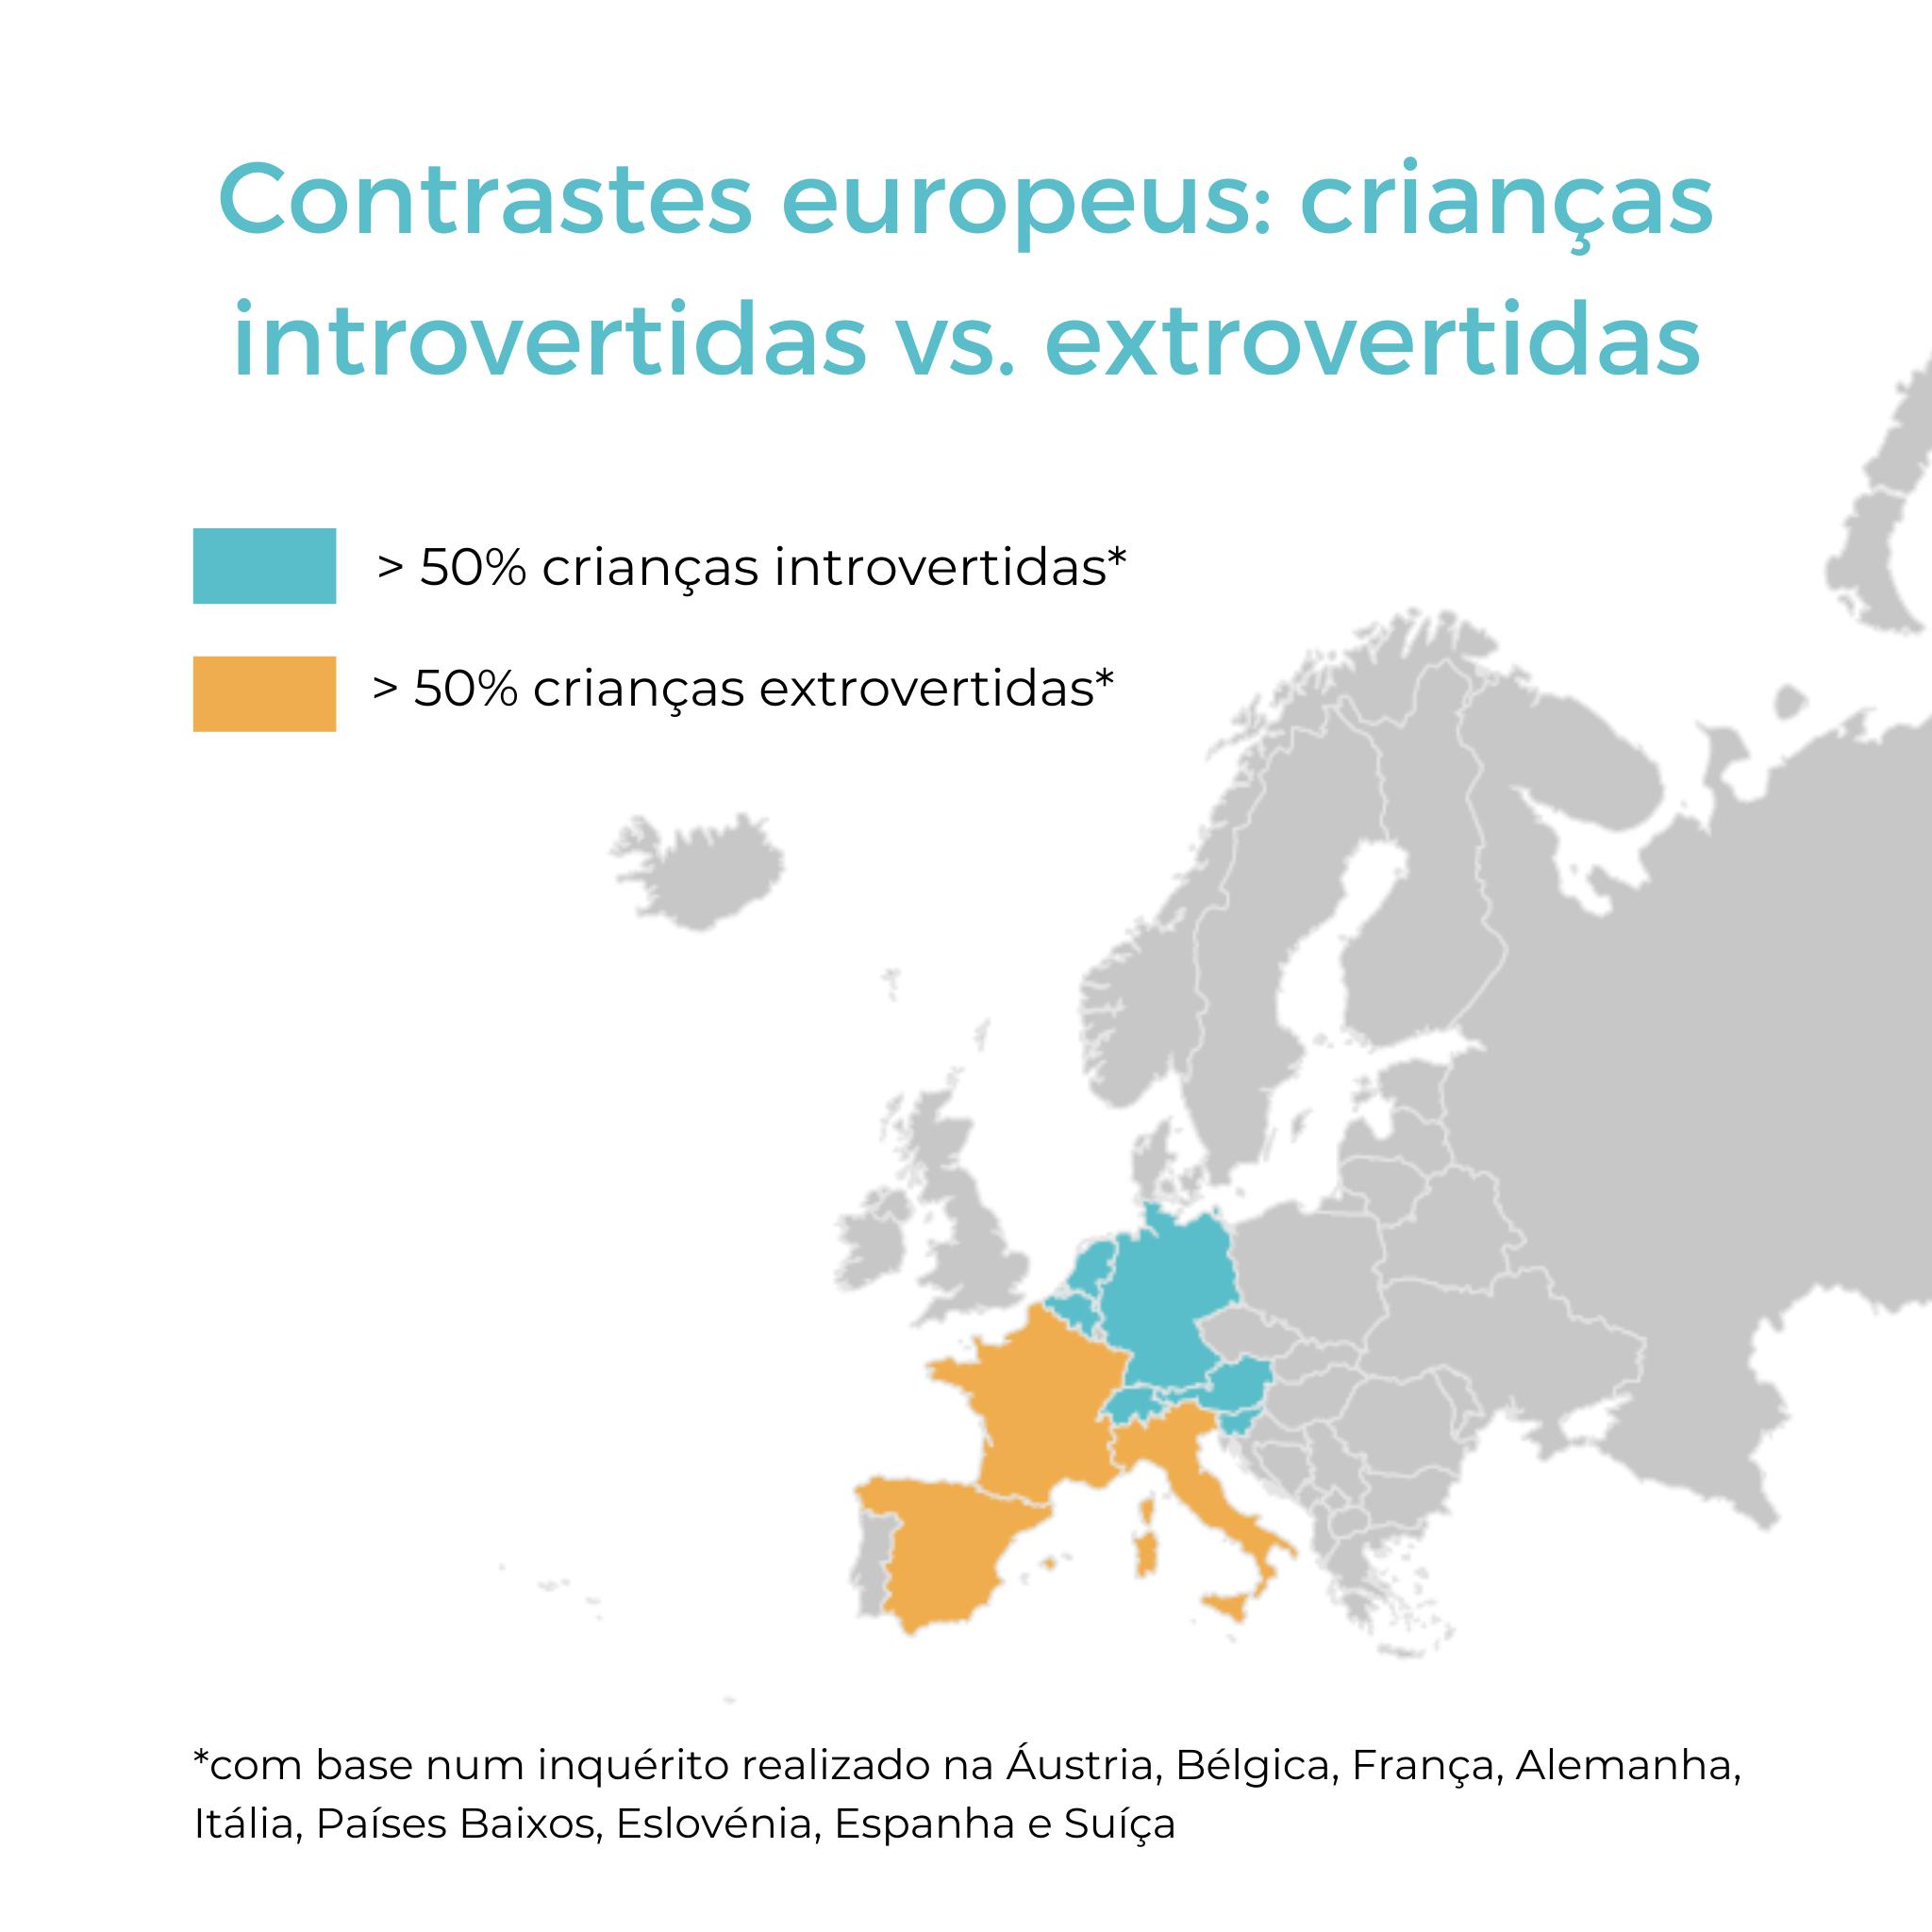 Crianças introvertidas e extrovertidas na Europa